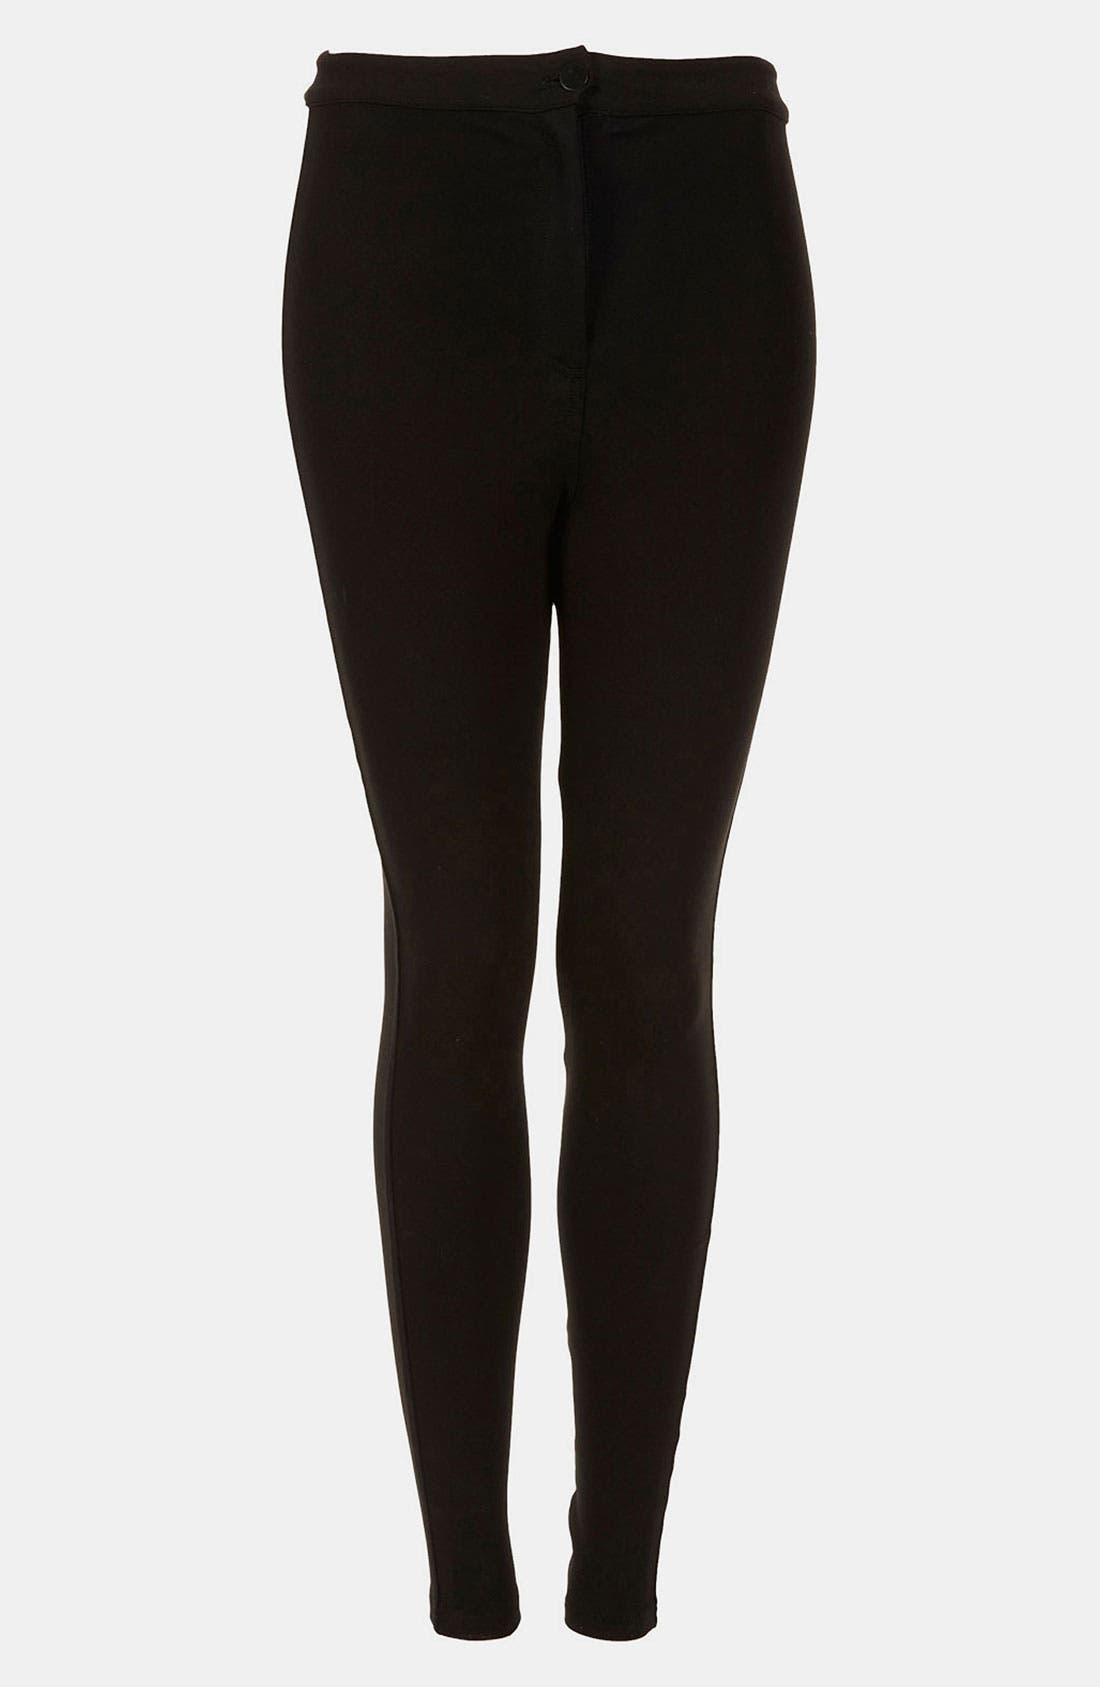 Main Image - Topshop High Waist Ponte Skinny Pants